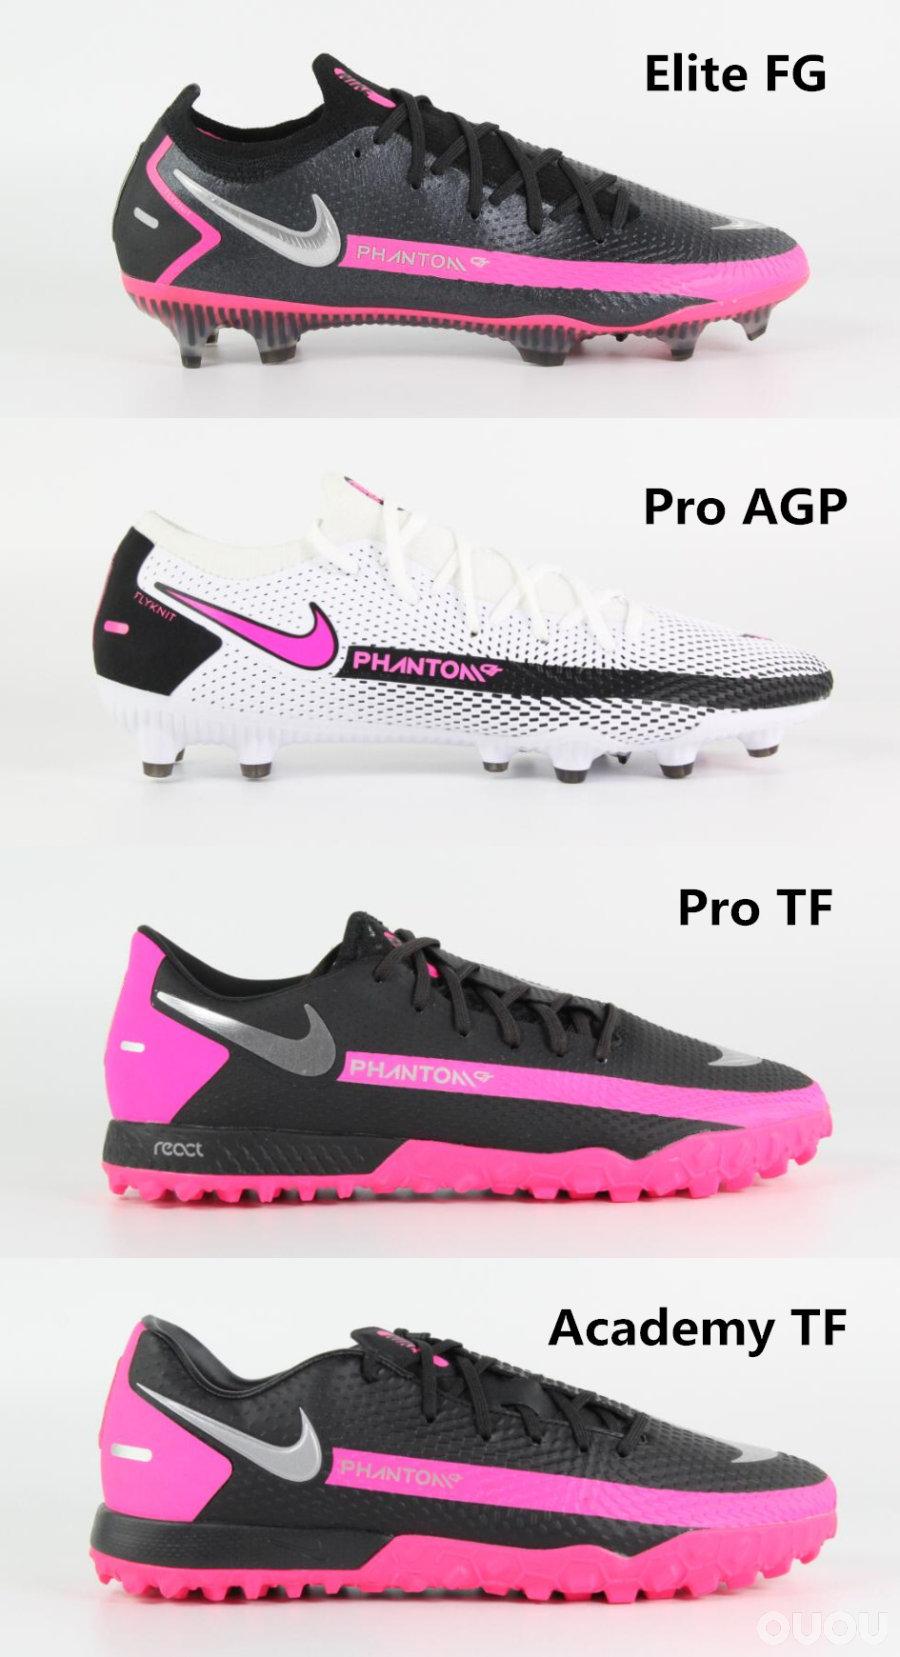 GT跑车很牛逼,那么带GT的足球鞋呢?耐克Phantom GT全系对比